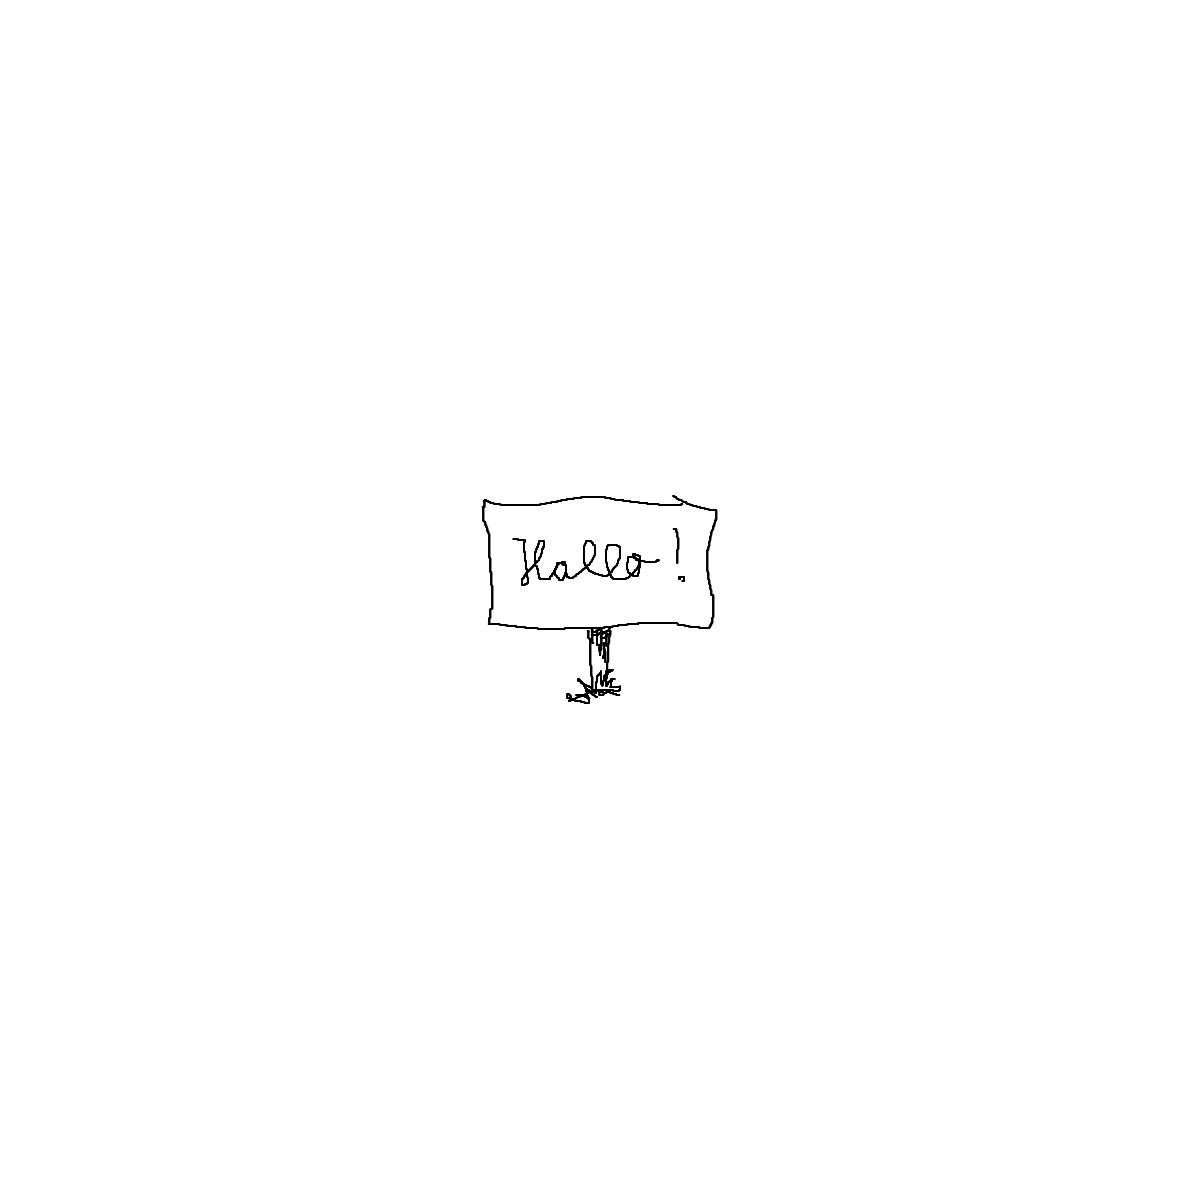 BAAAM drawing#8042 lat:47.4899597167968750lng: -52.7172889709472660